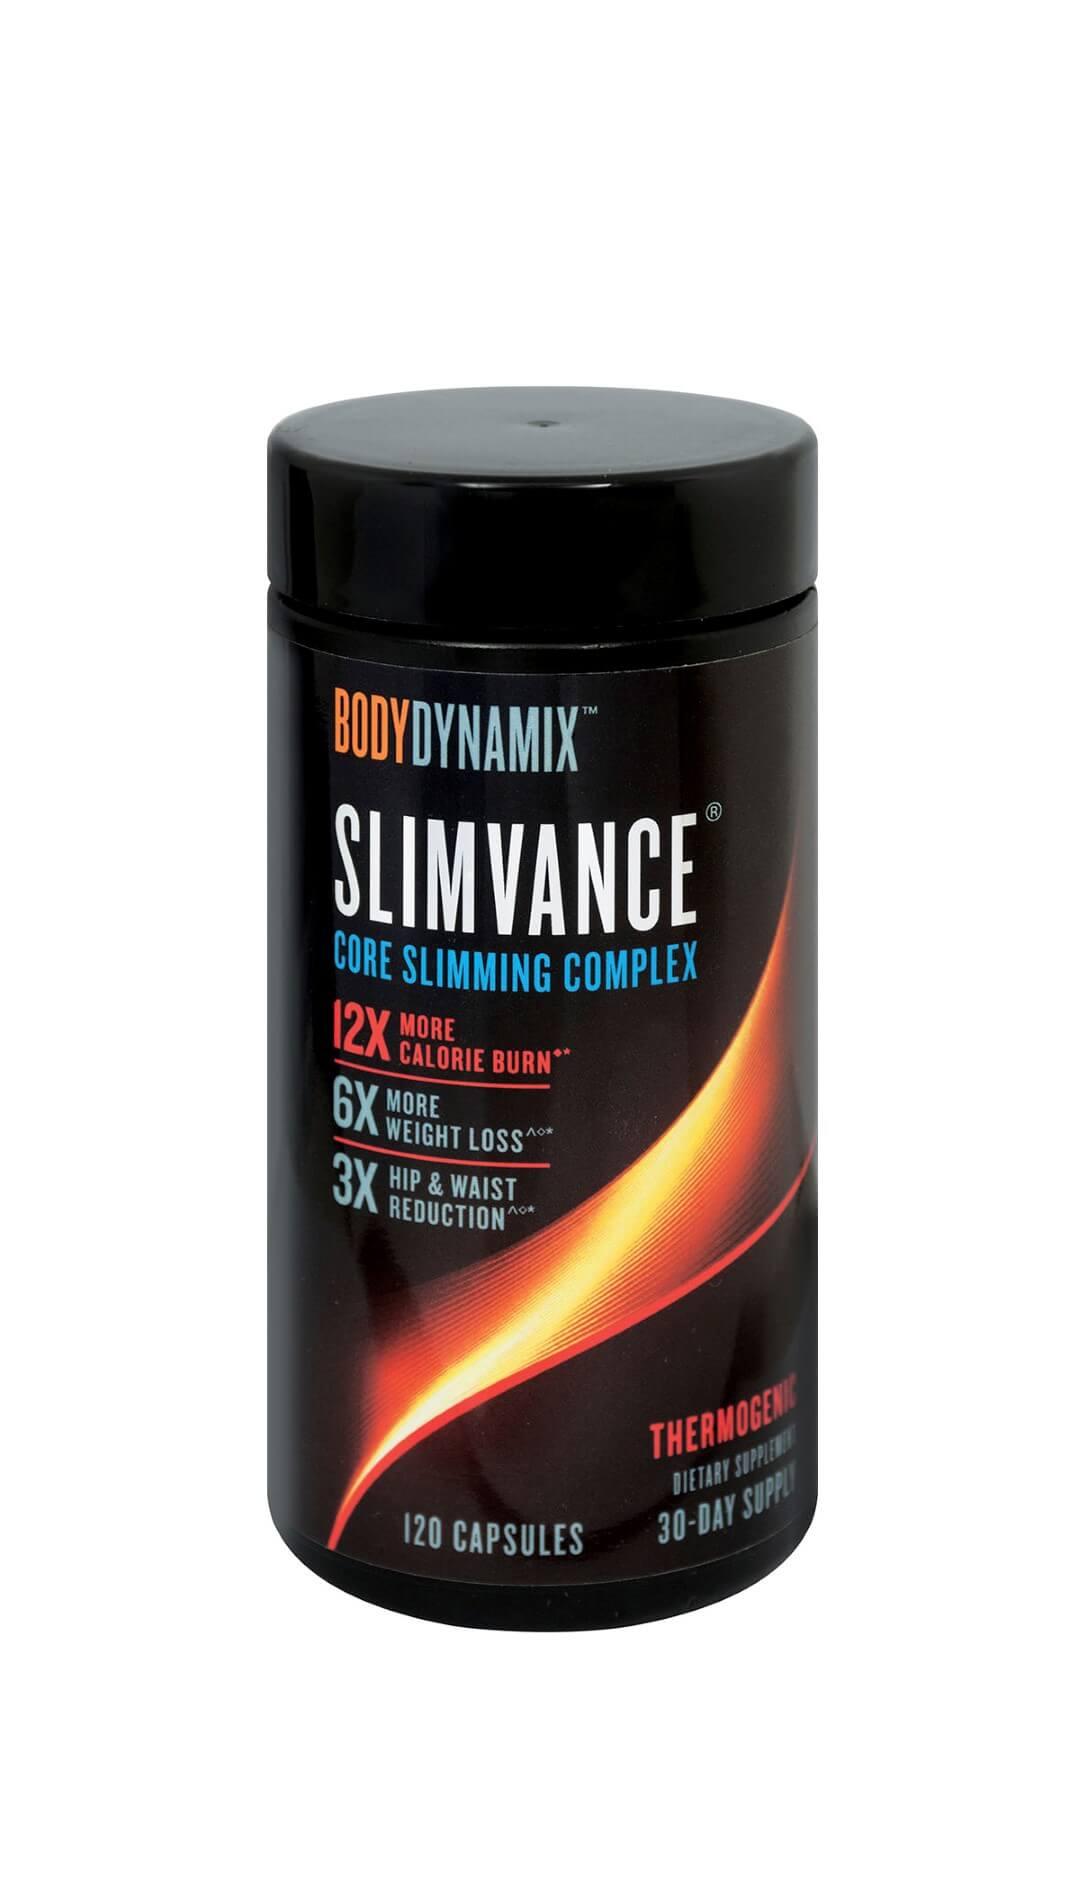 Slimvance® 倍纤12X